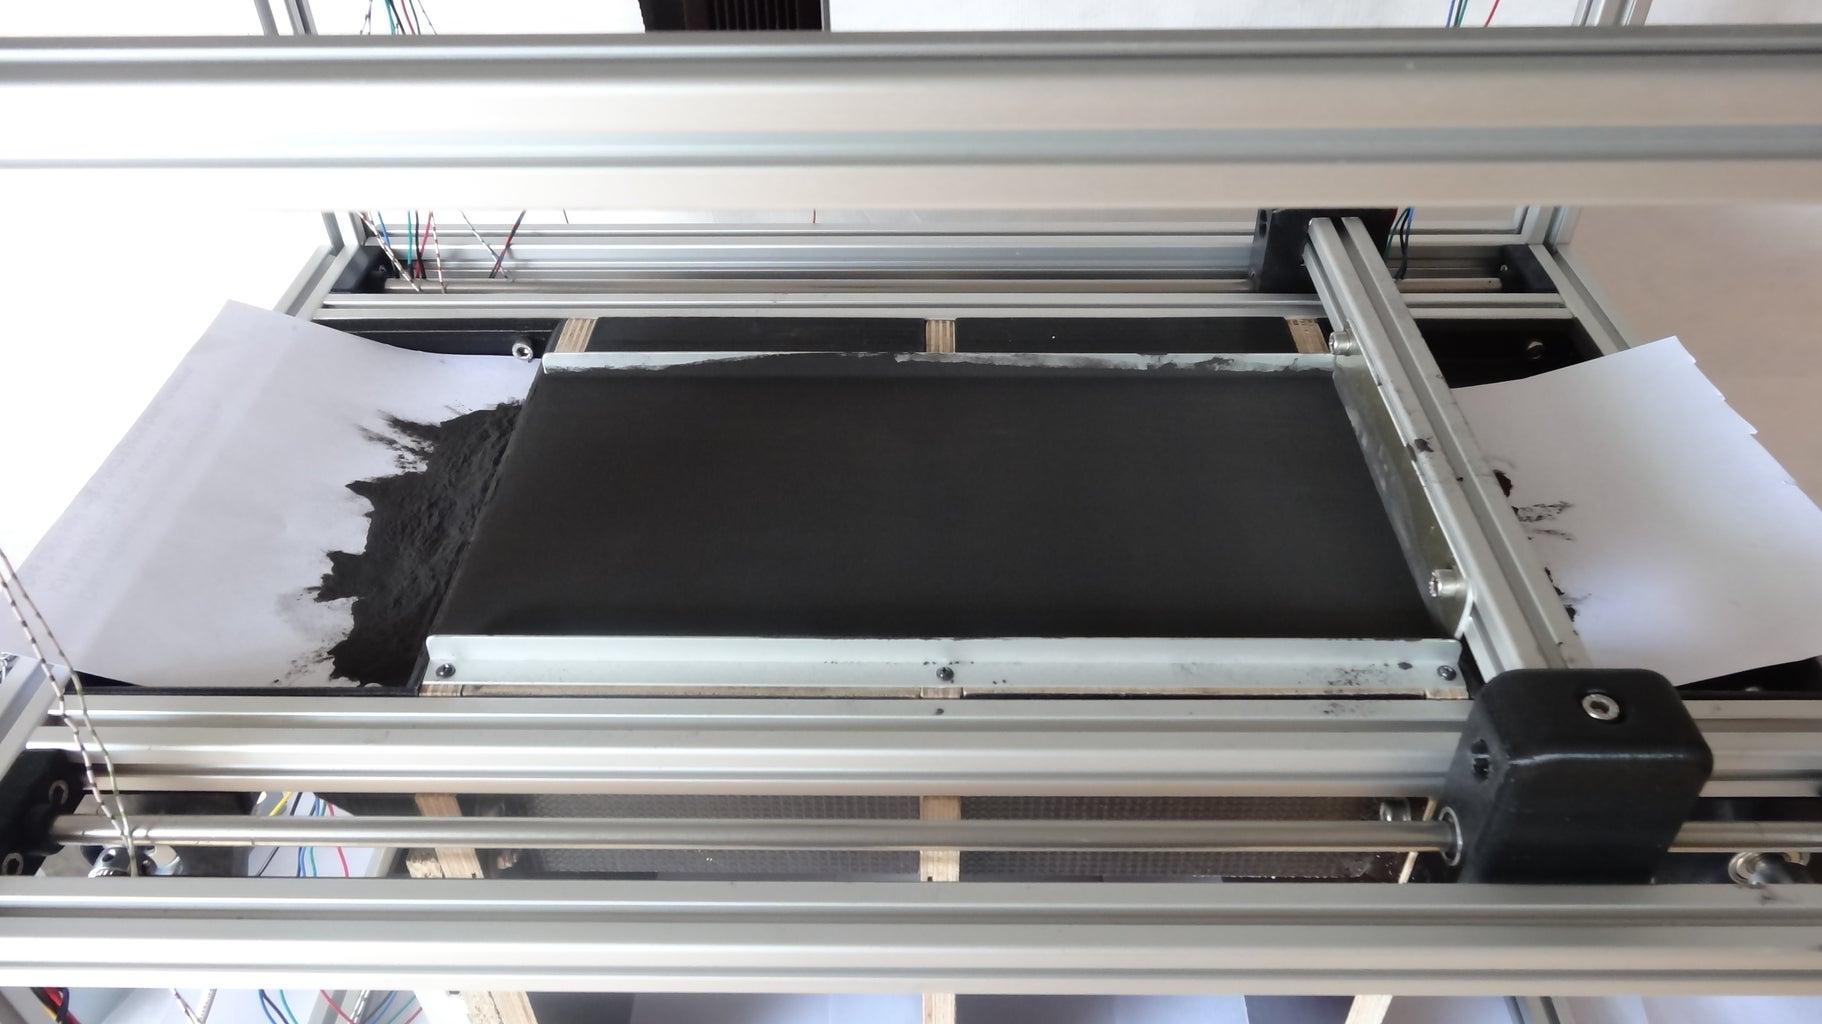 Video / Test Prints